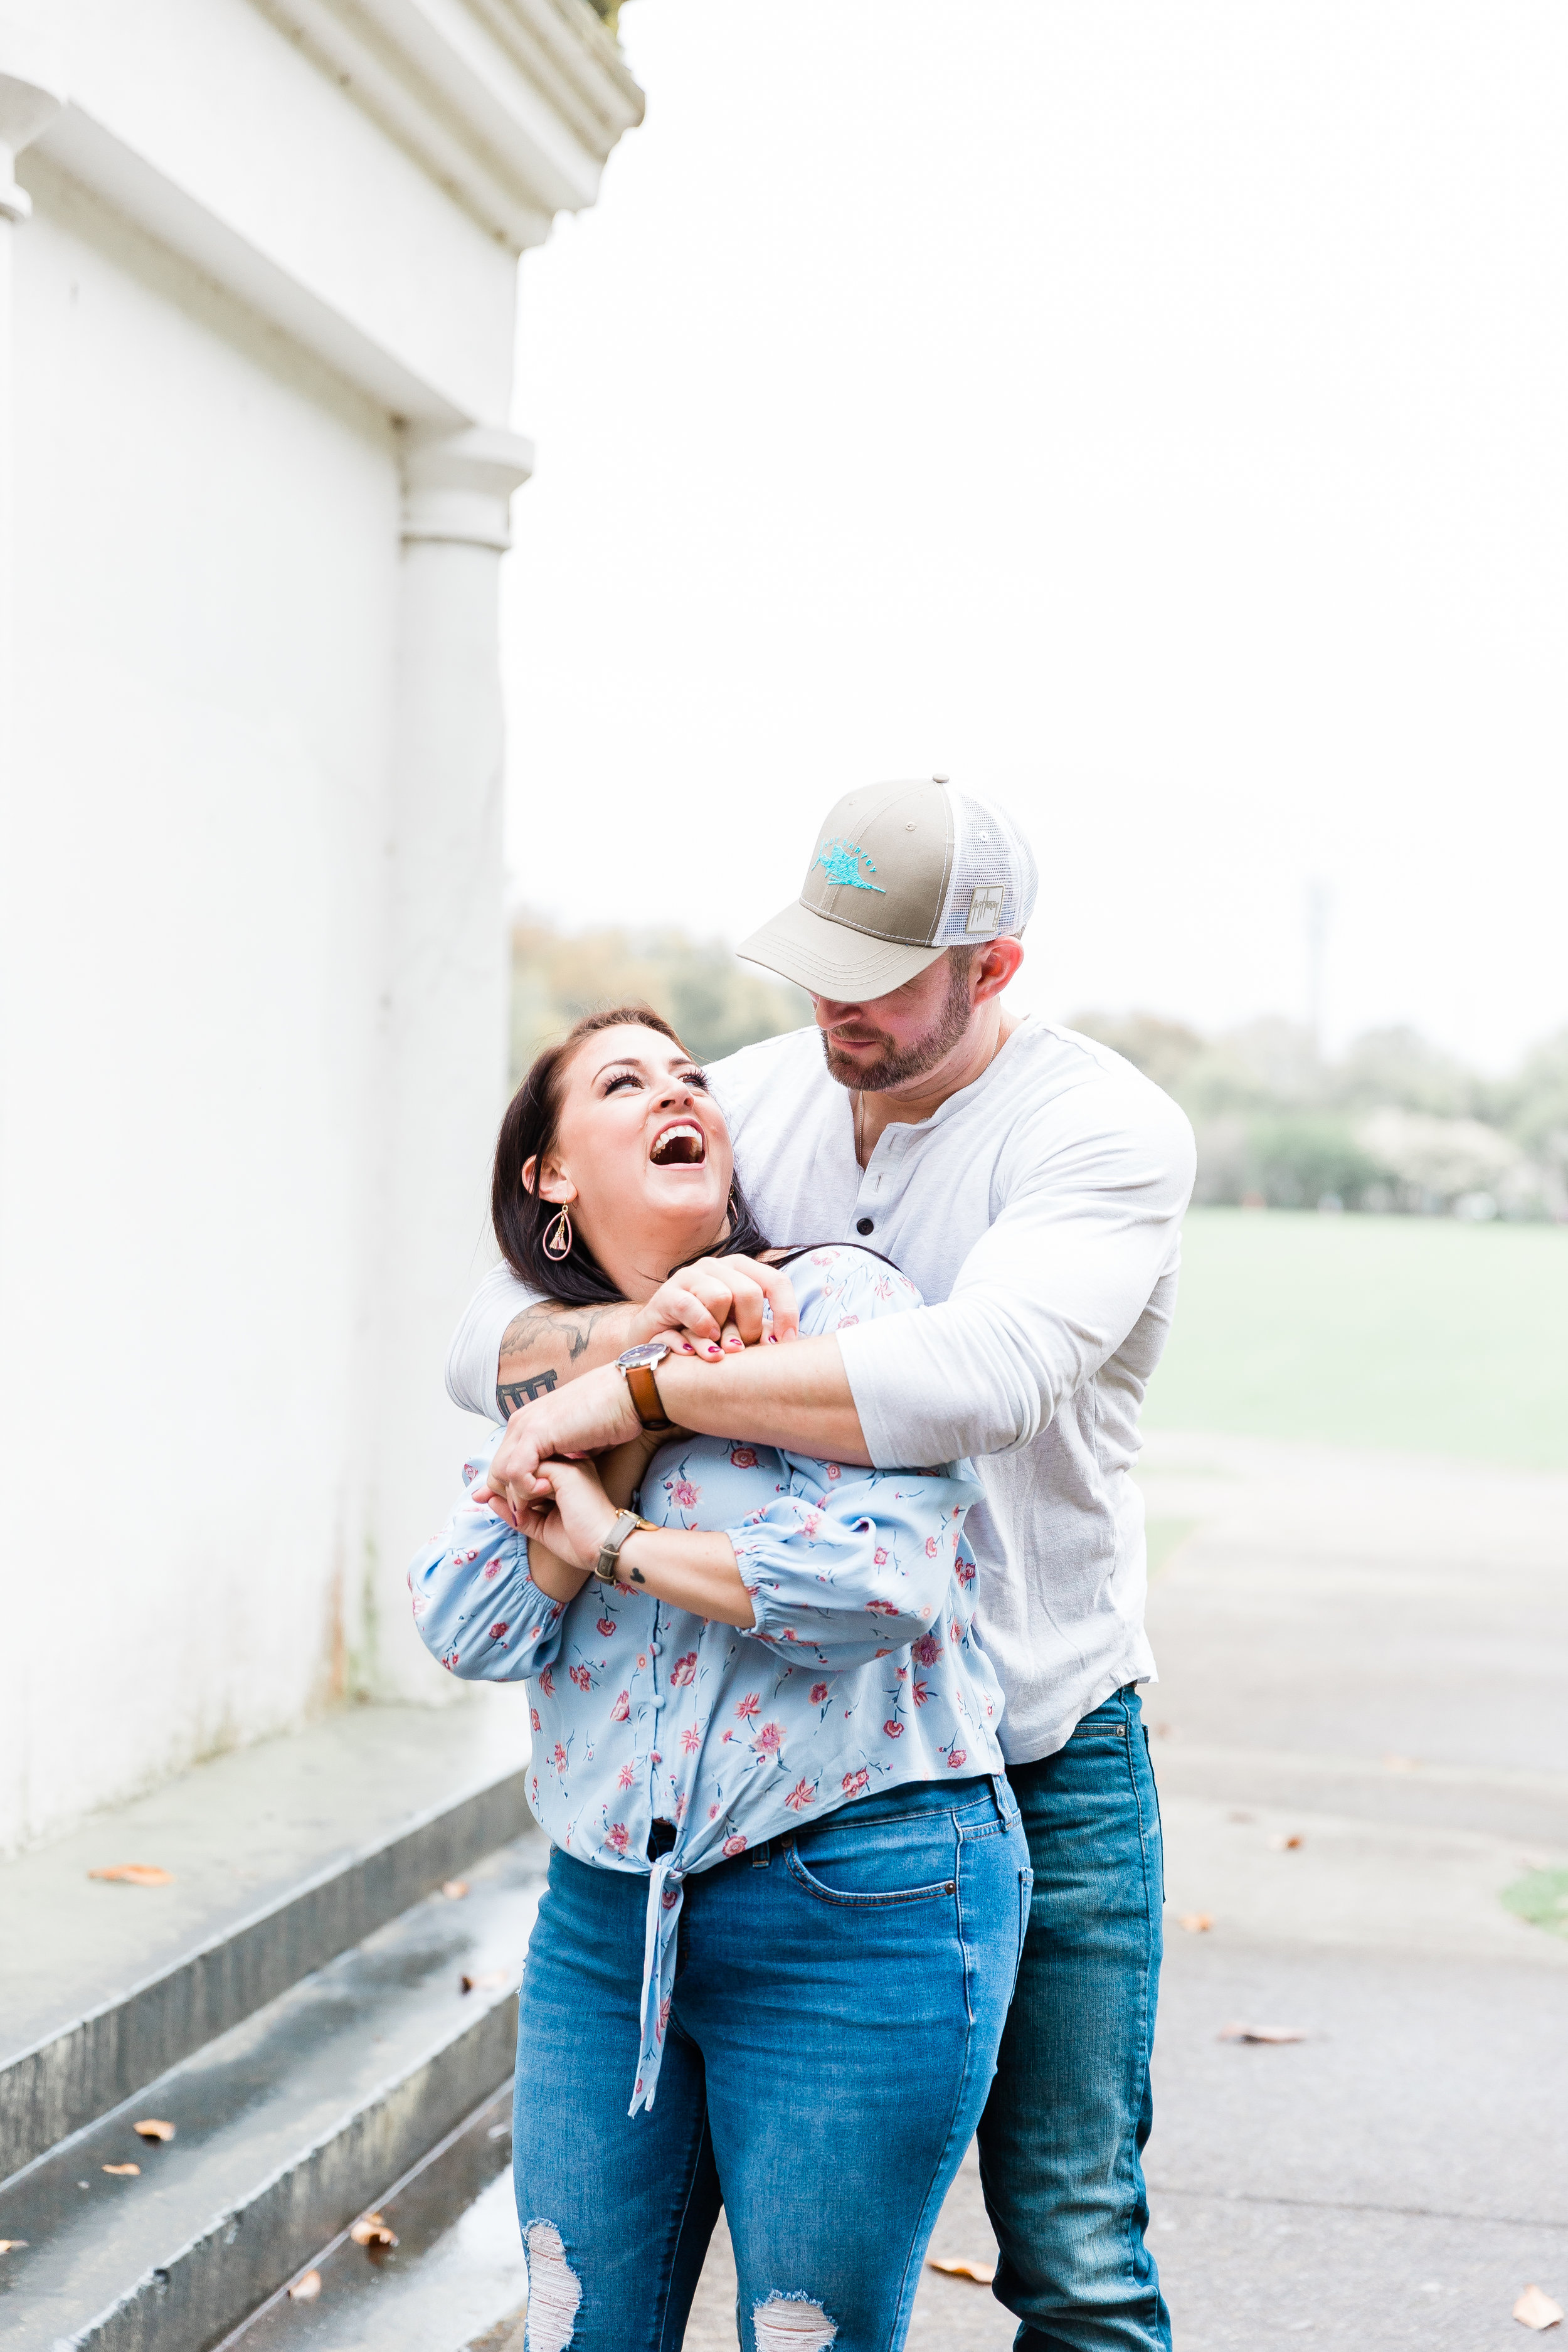 20190406-Southern Lens Photography-savannah wedding photographer-Erin and Chad-Savannah Engagement-2019114.jpg